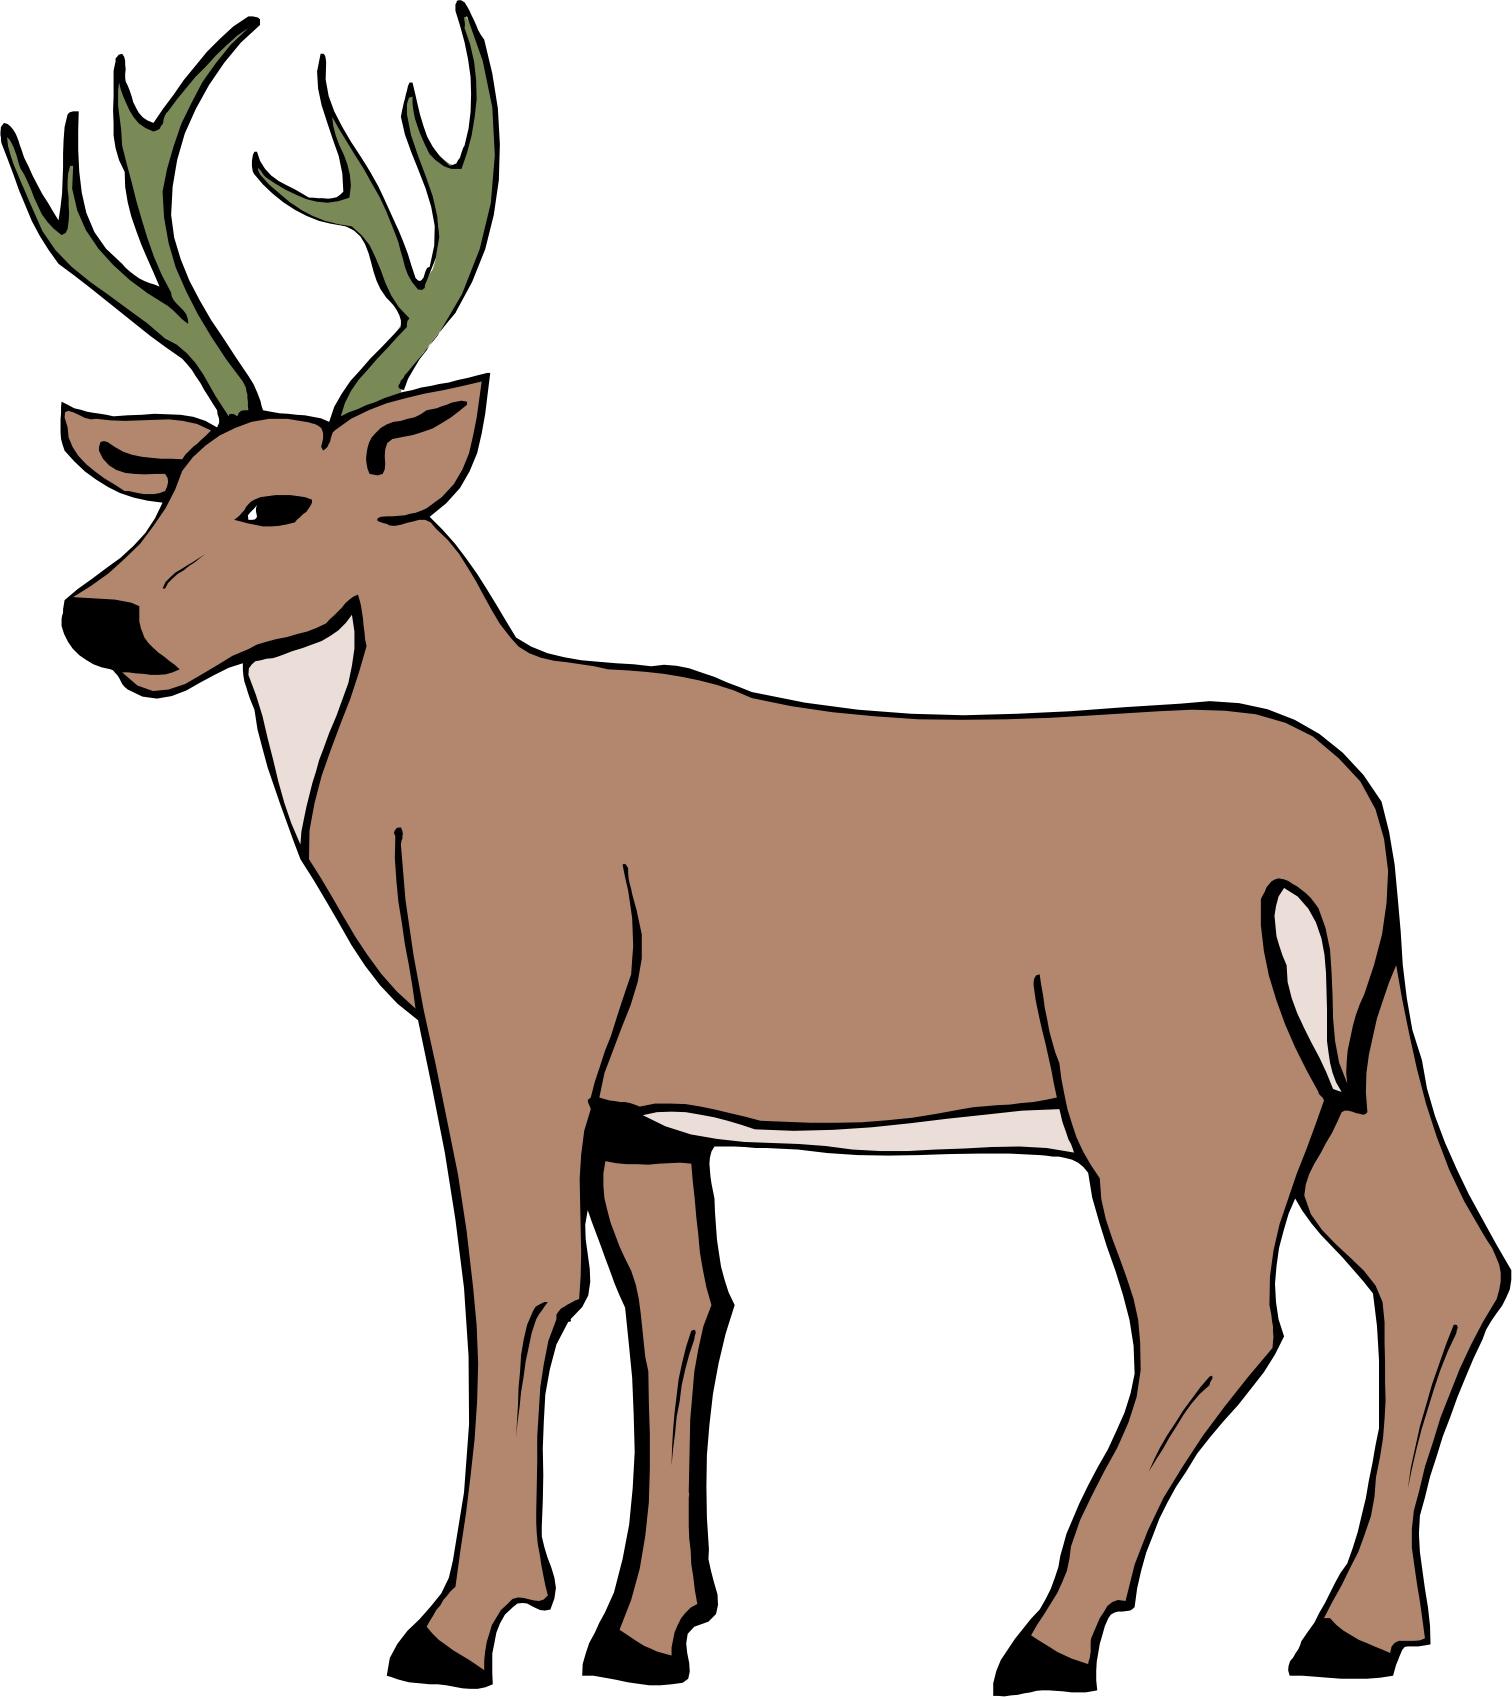 1512x1697 Cartoon Deer Cartoon Deer Page 2 Cartoon Drawing Ideas